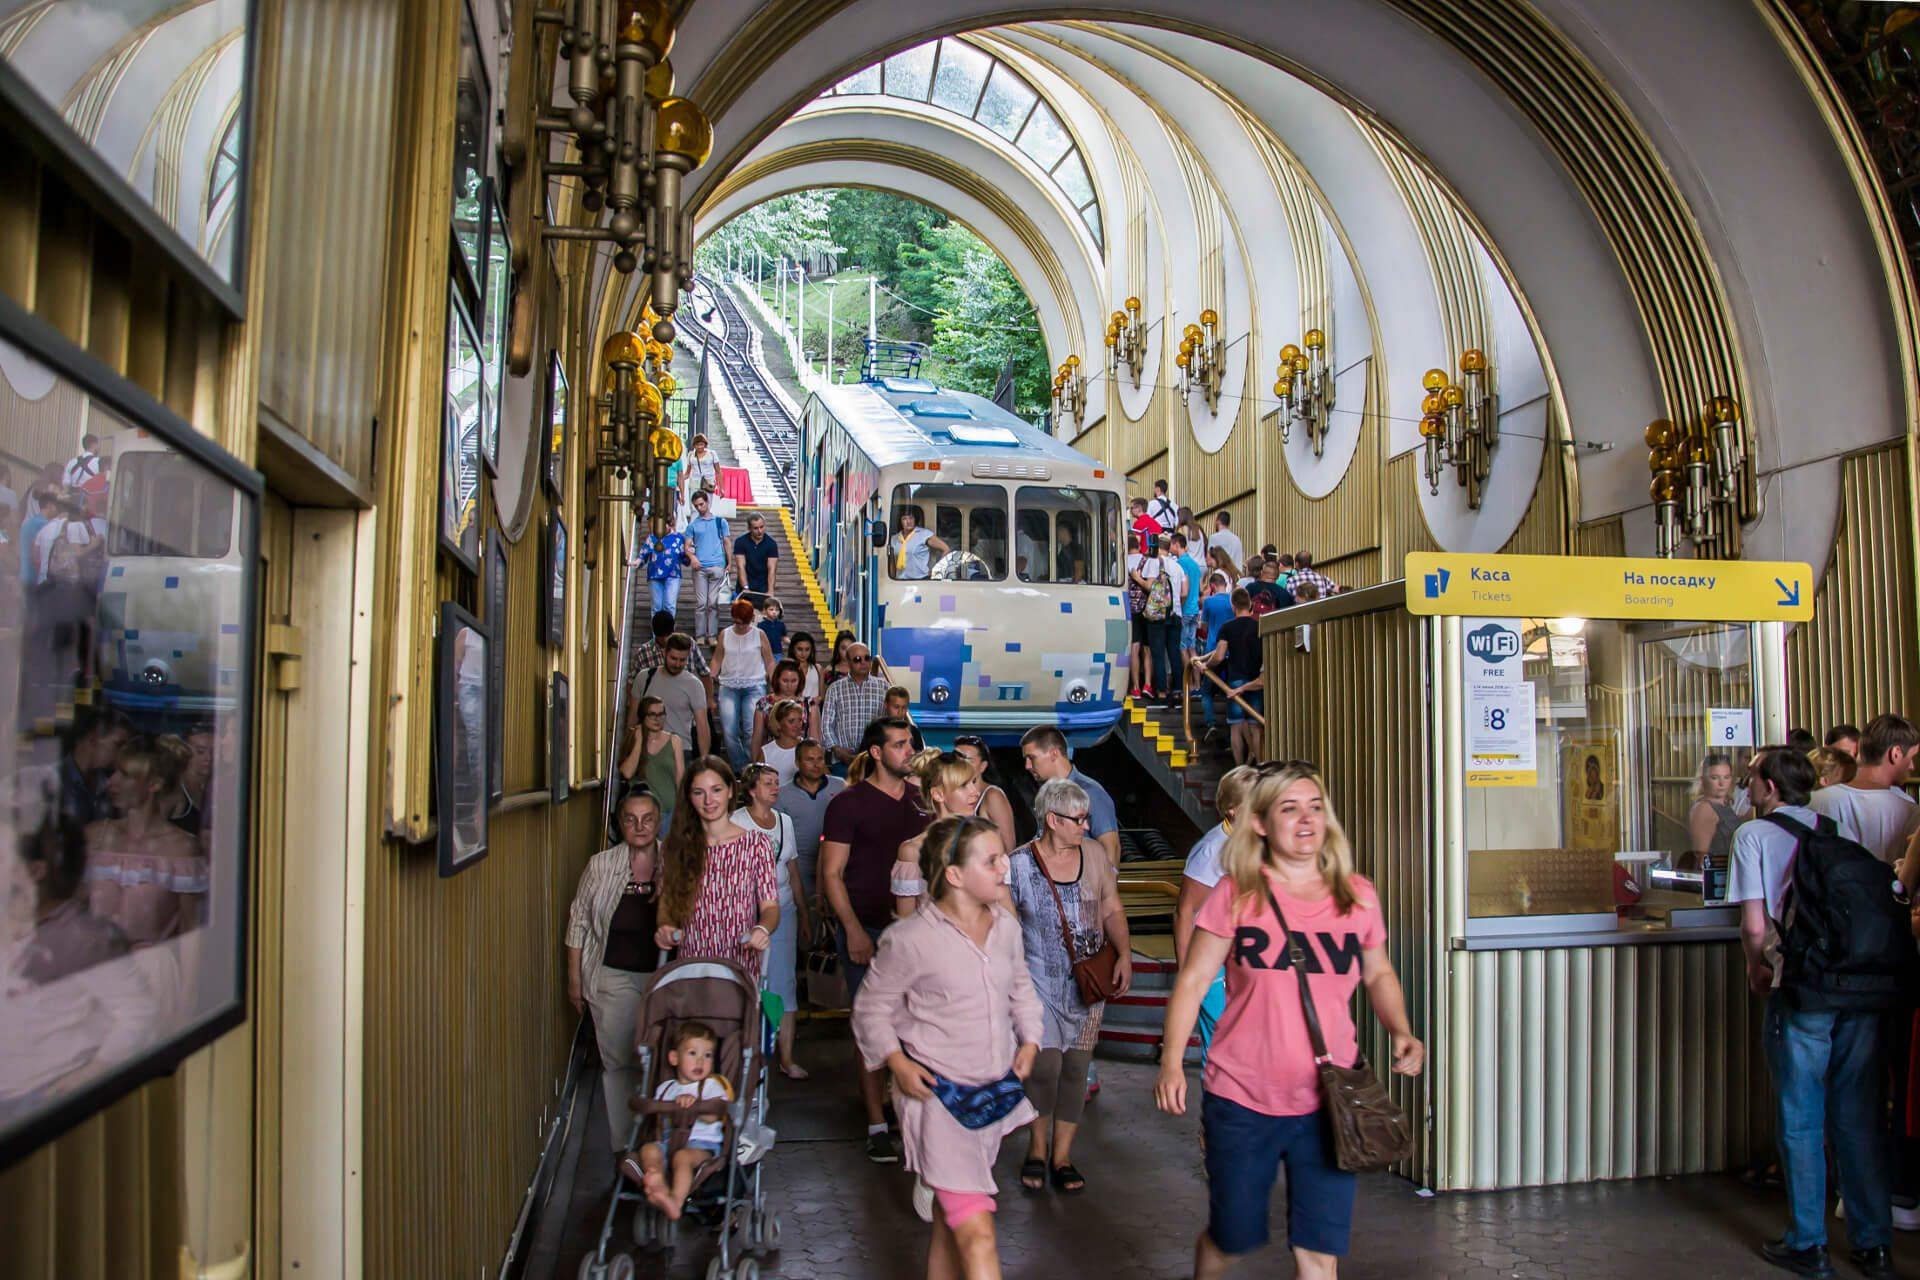 Funikulat w Kijowie